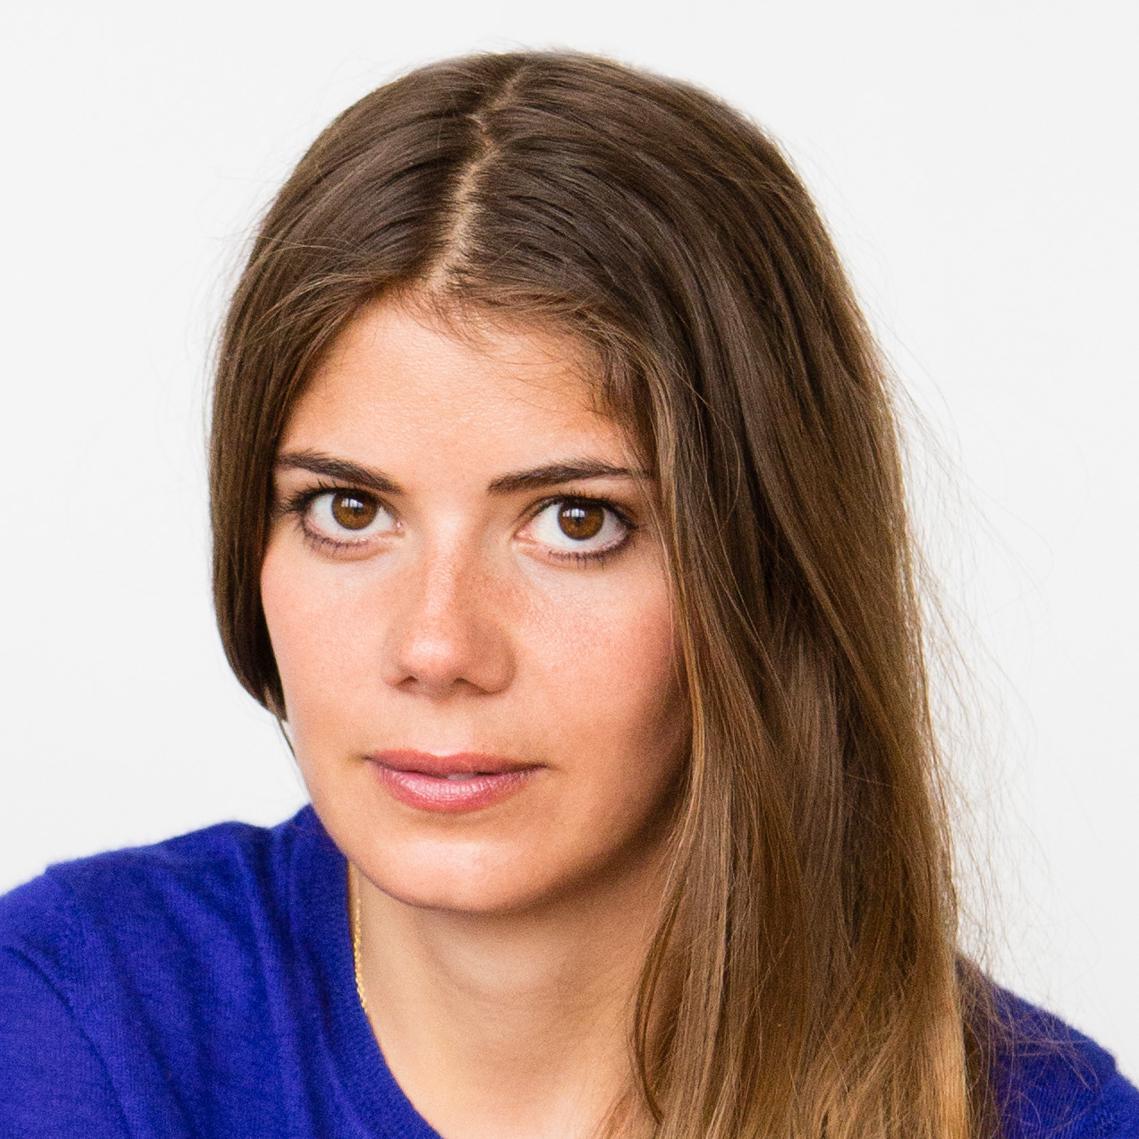 Lactivit de Jeanne Deroo  Journaliste Beaut  Elle